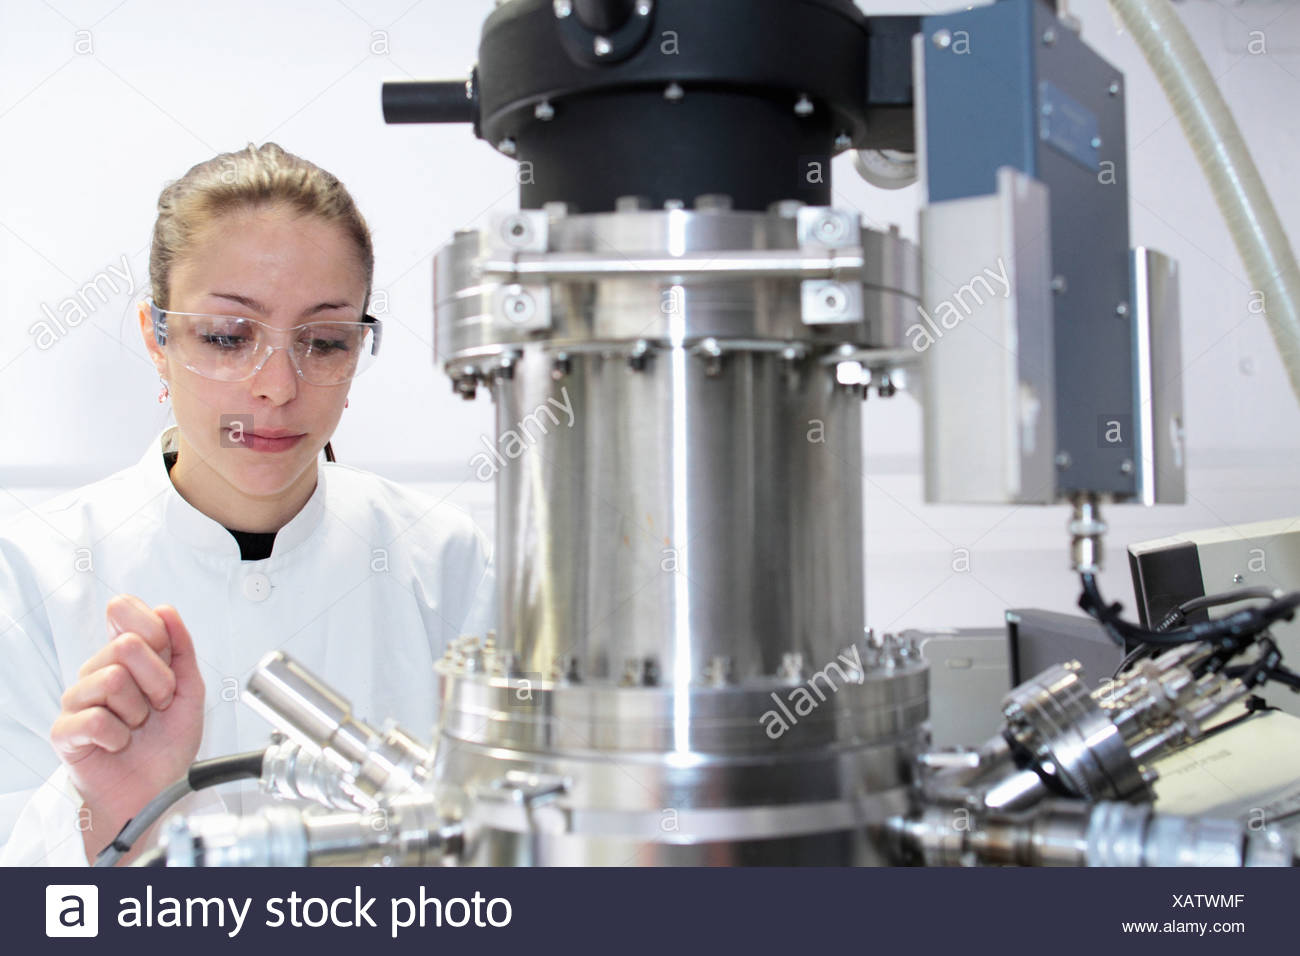 Female lab technician operating scientific equipment - Stock Image